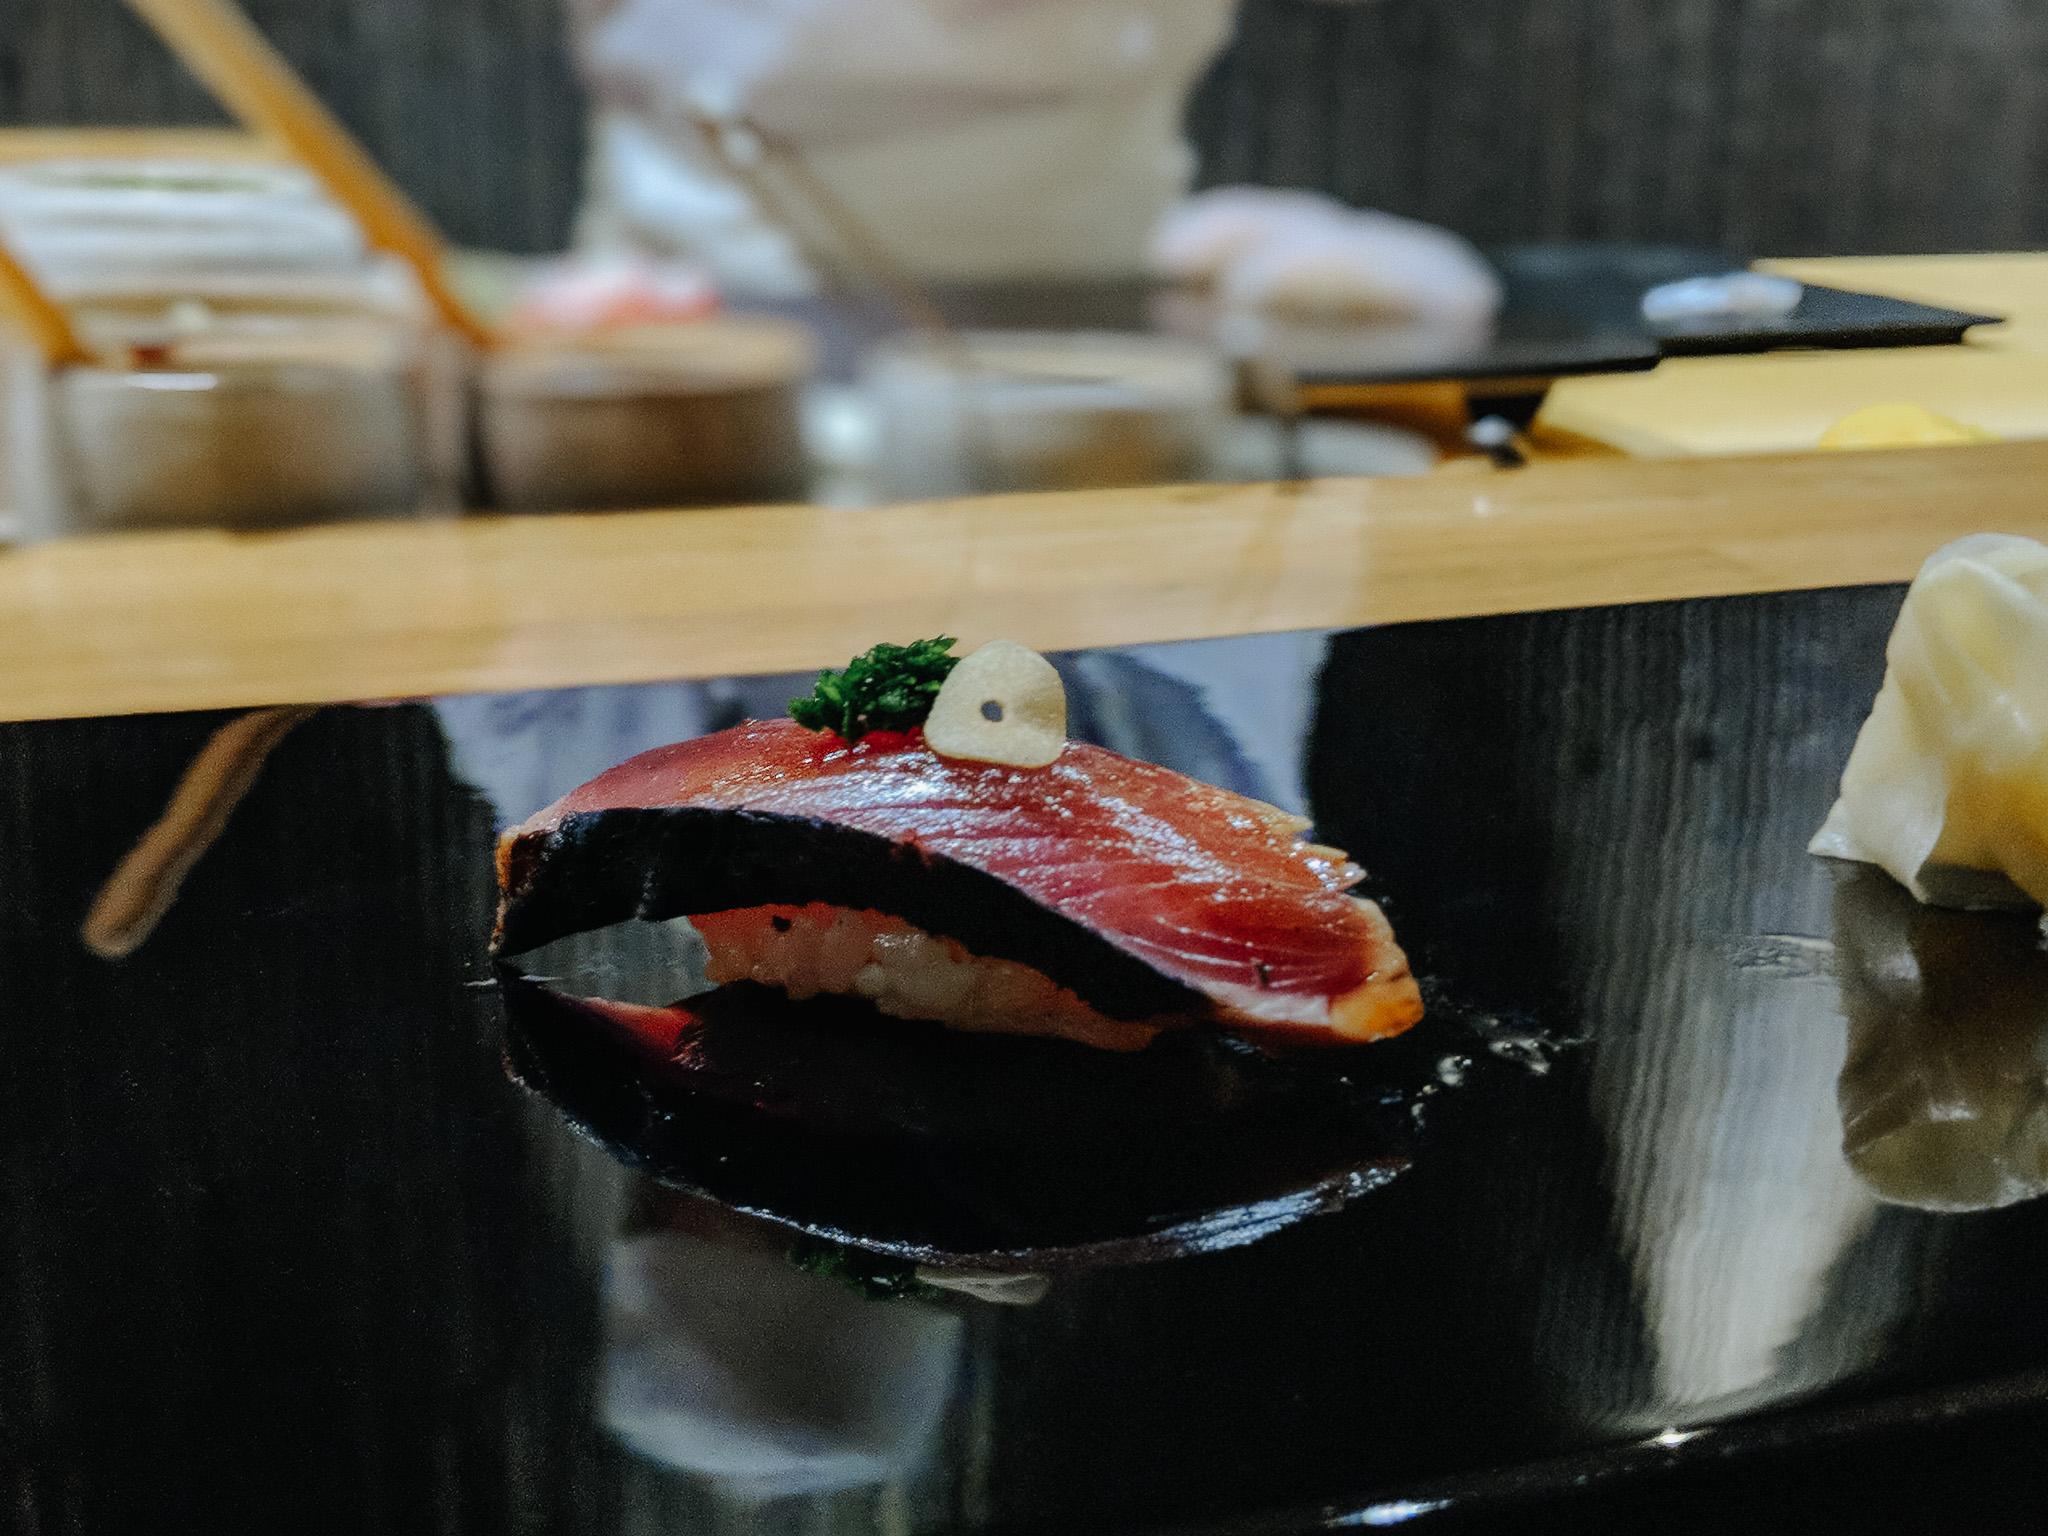 minamishima-melbourne-food-photographer-012.JPG